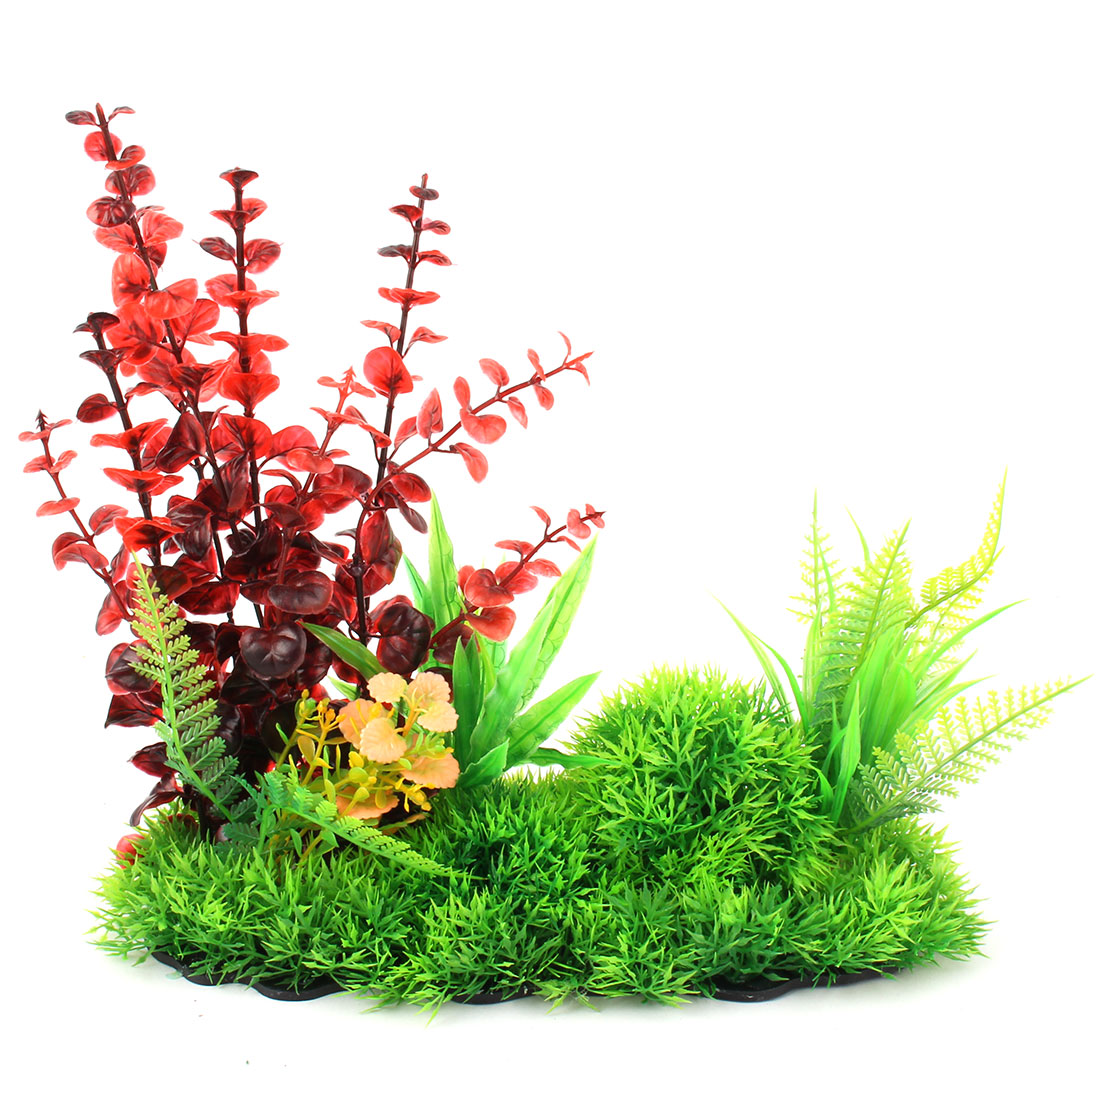 Aquarium Fish Tank Plastic Manmade Leaves Water Grass Plant Ornament Red Green